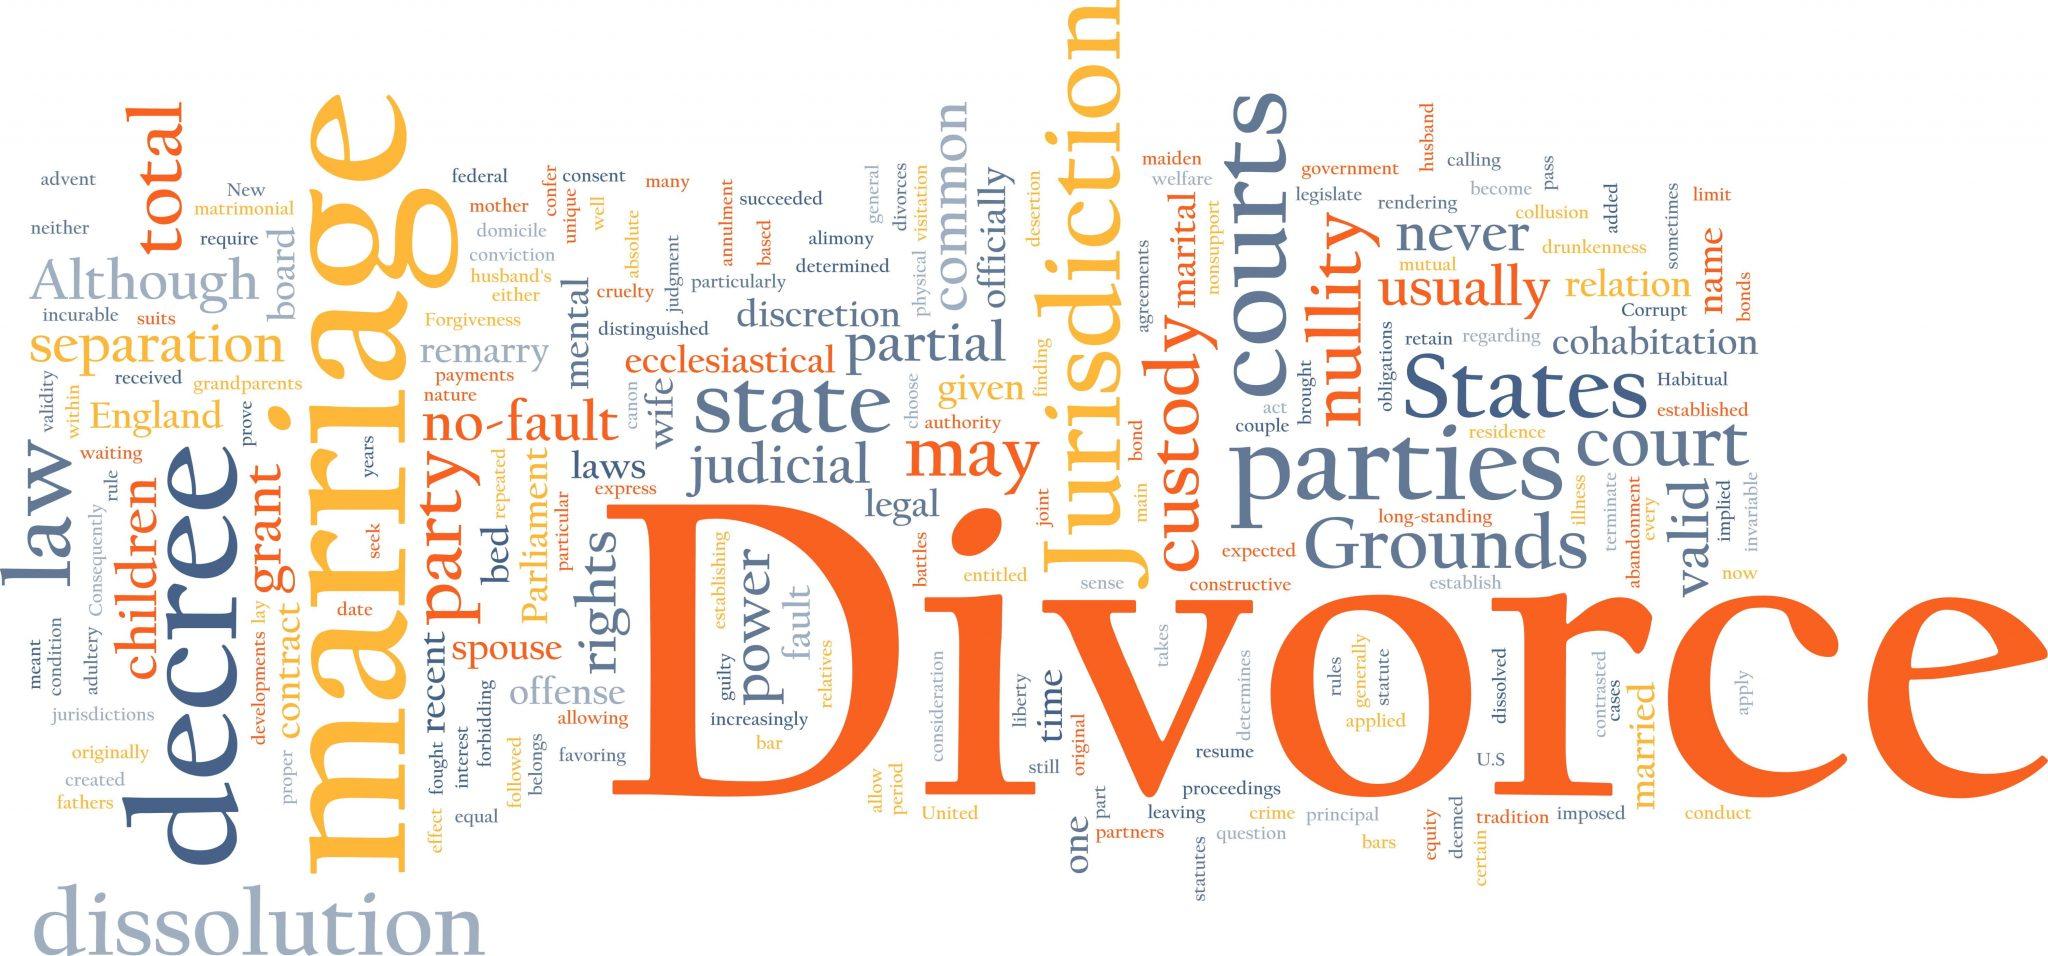 divorce words image